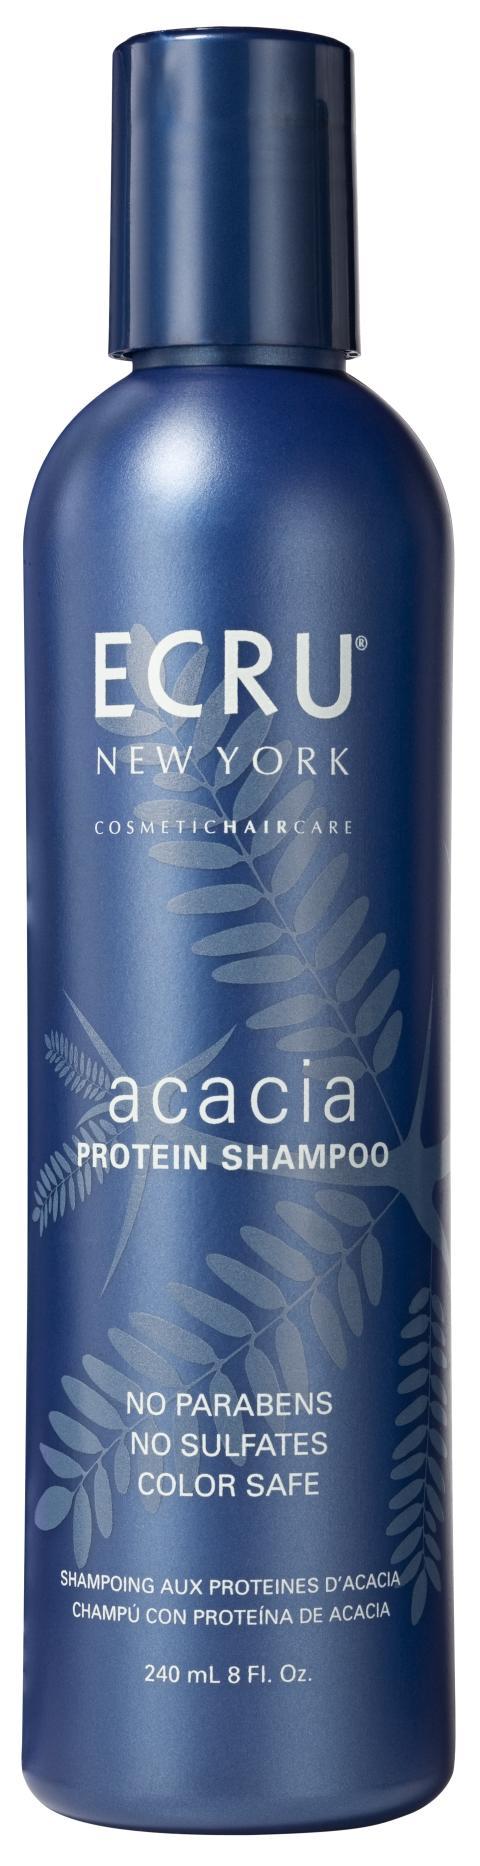 Acacia Protein Shampoo